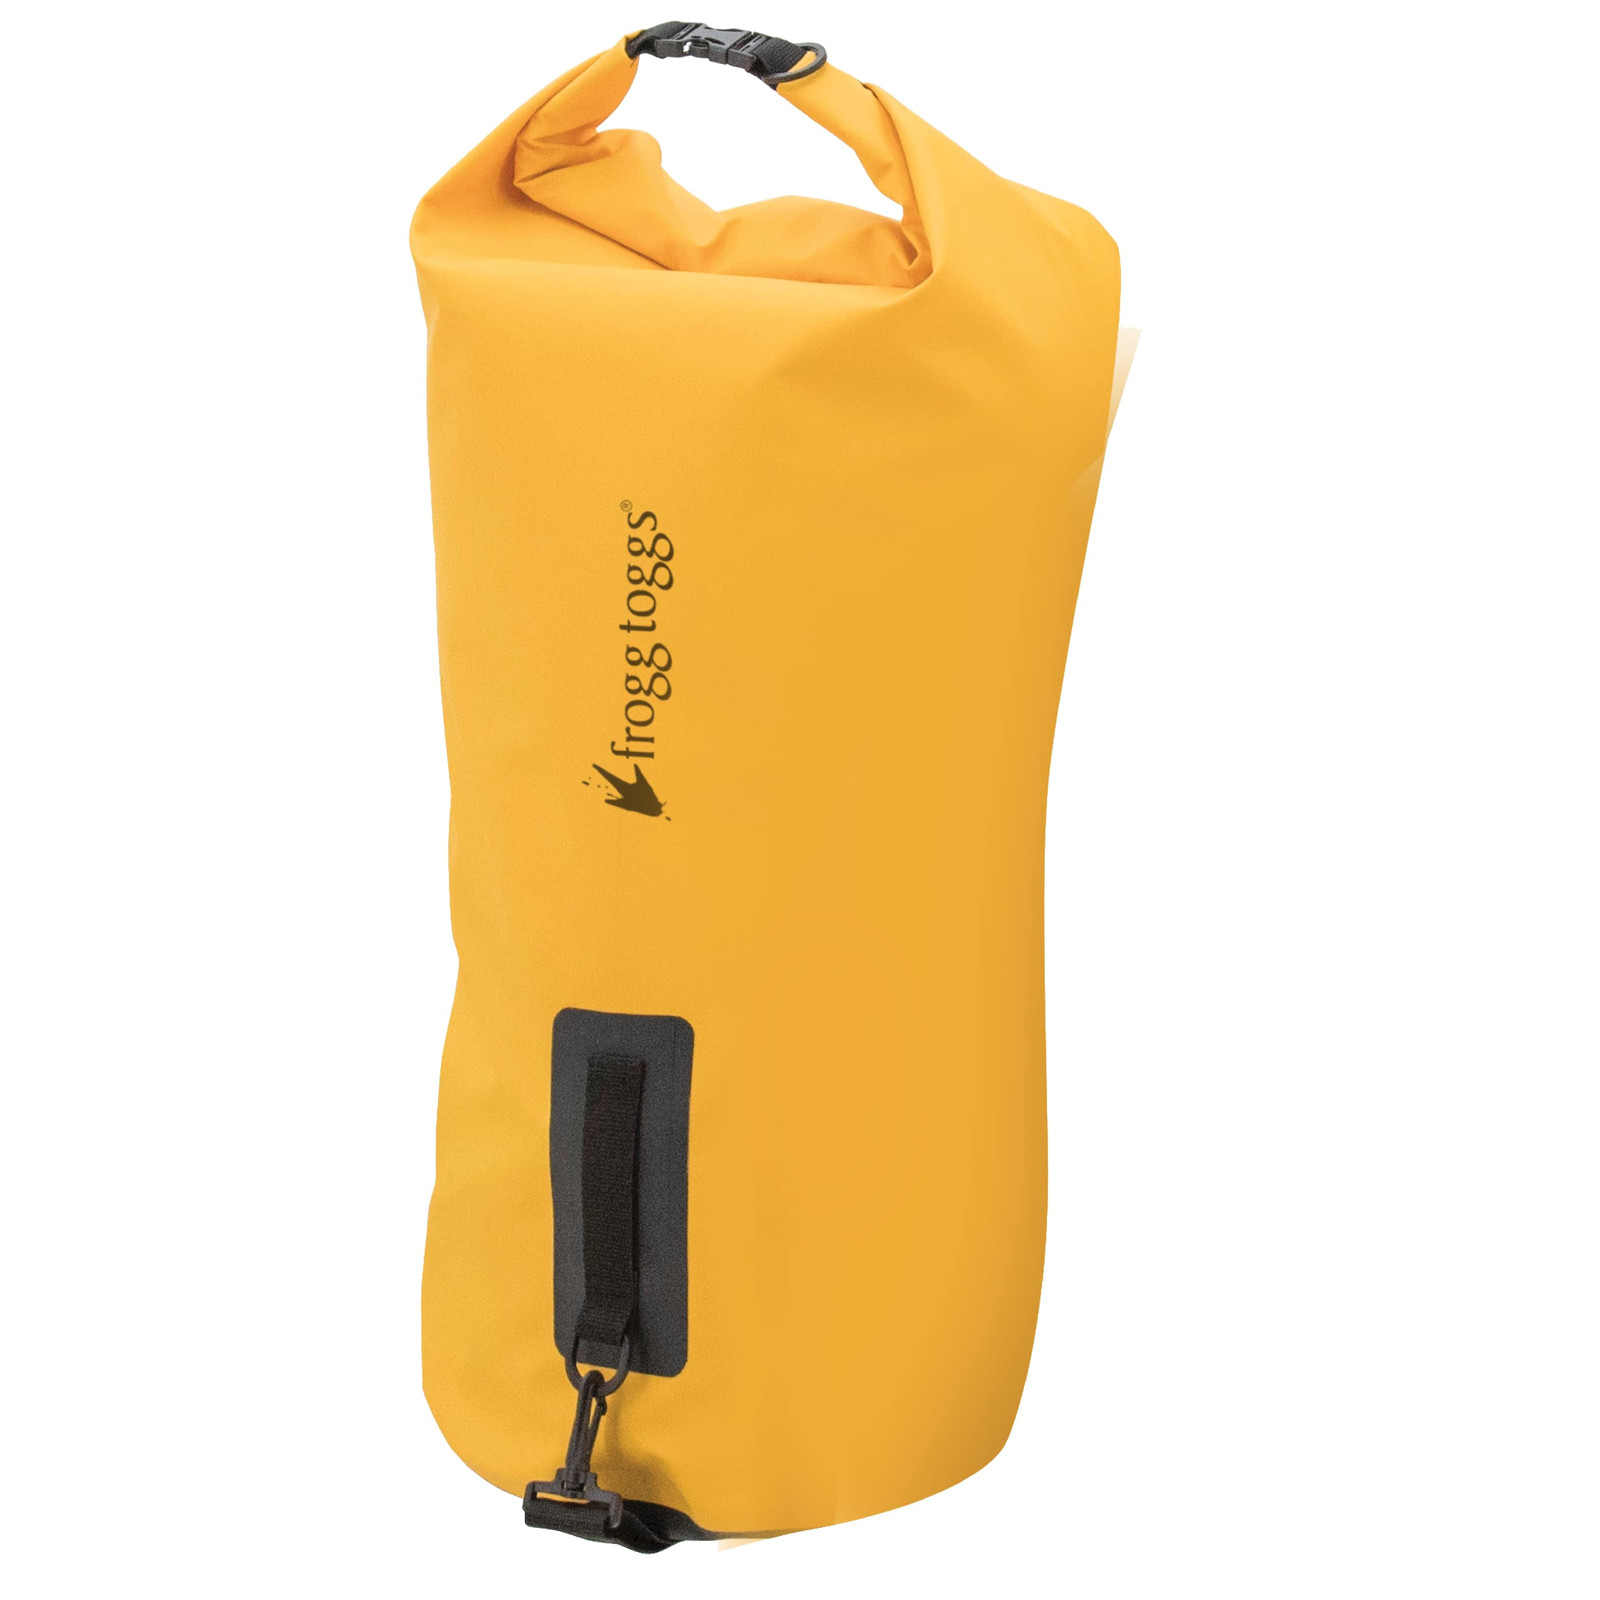 FTX Gear PVC Tarpaulin Waterproof Dry Bag-large